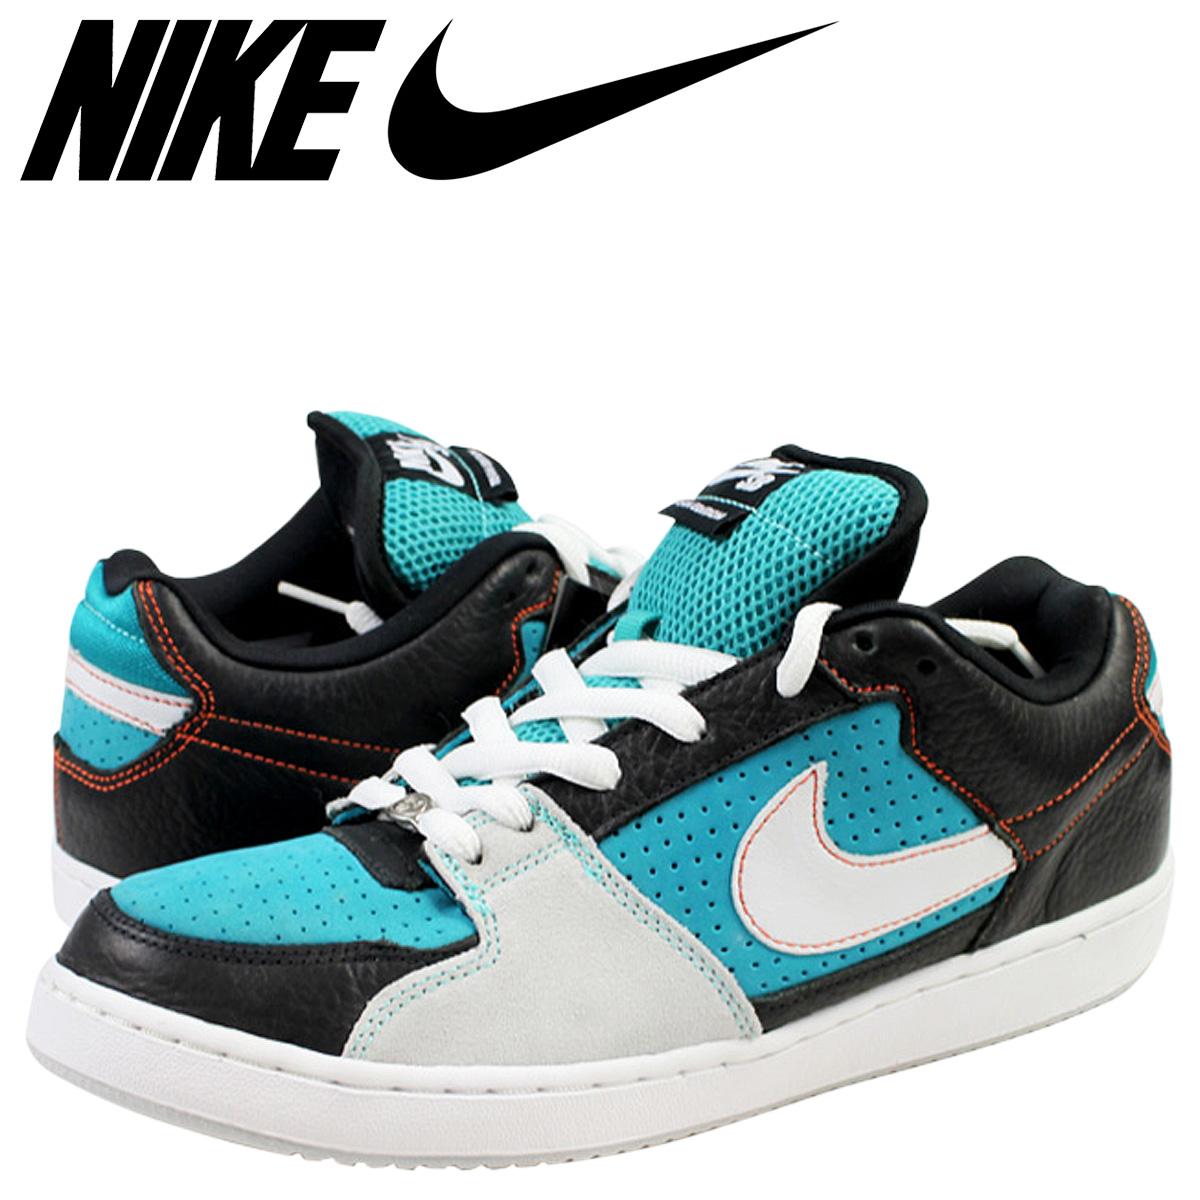 NIKE Nike zoom sneakers ZOOM TEAM EDITION team edition 311,665 311 blue men